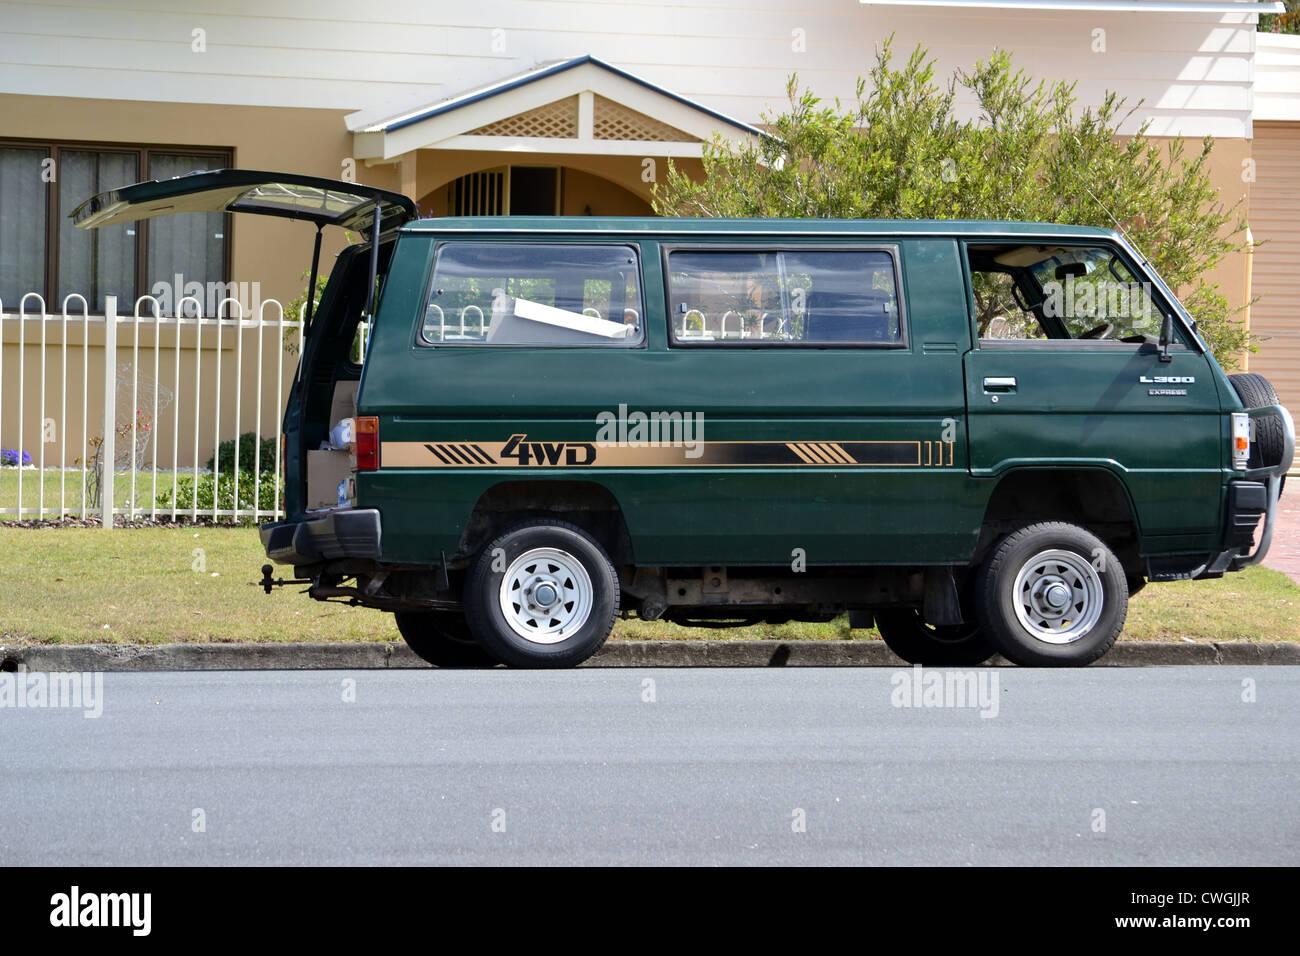 1985 Mitsubishi L300 Express Stock Photo: 50153007